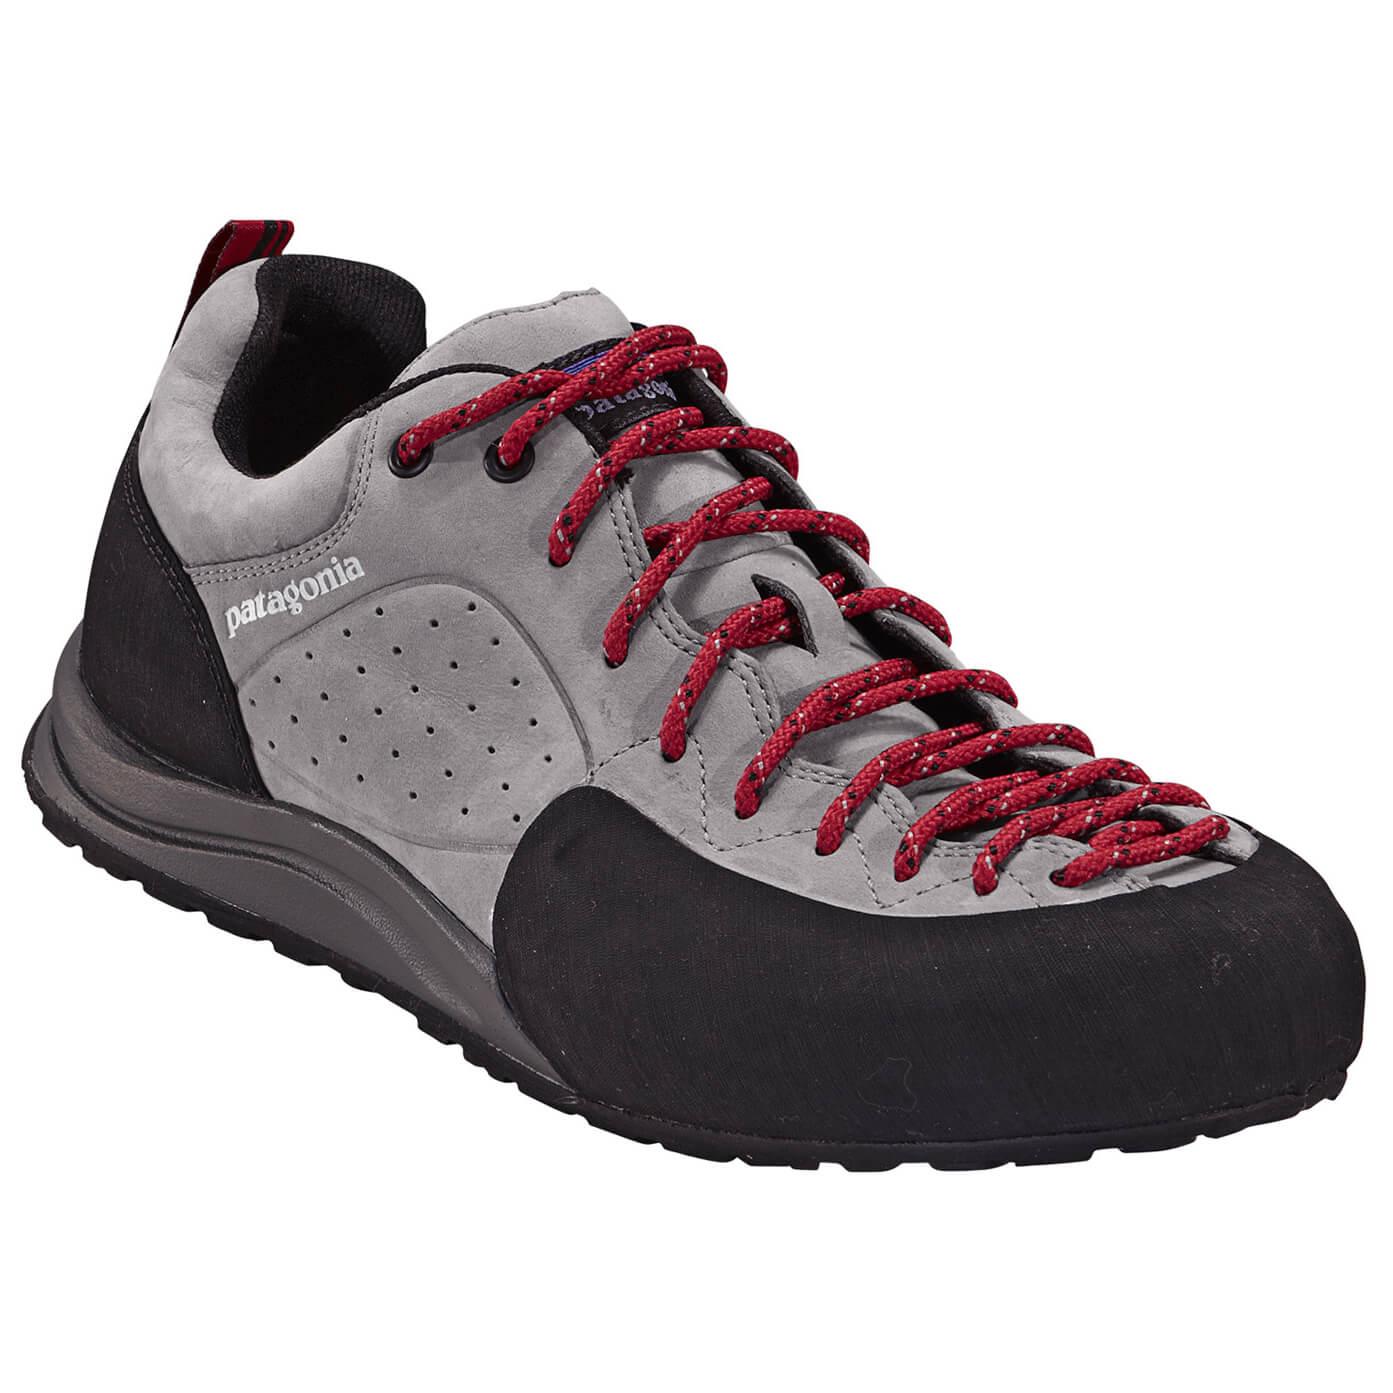 Garanzia di soddisfazione al 100% enorme inventario nessuna tassa di vendita Patagonia Cragmaster - Scarpe da trekking Uomo   Acquista online ...